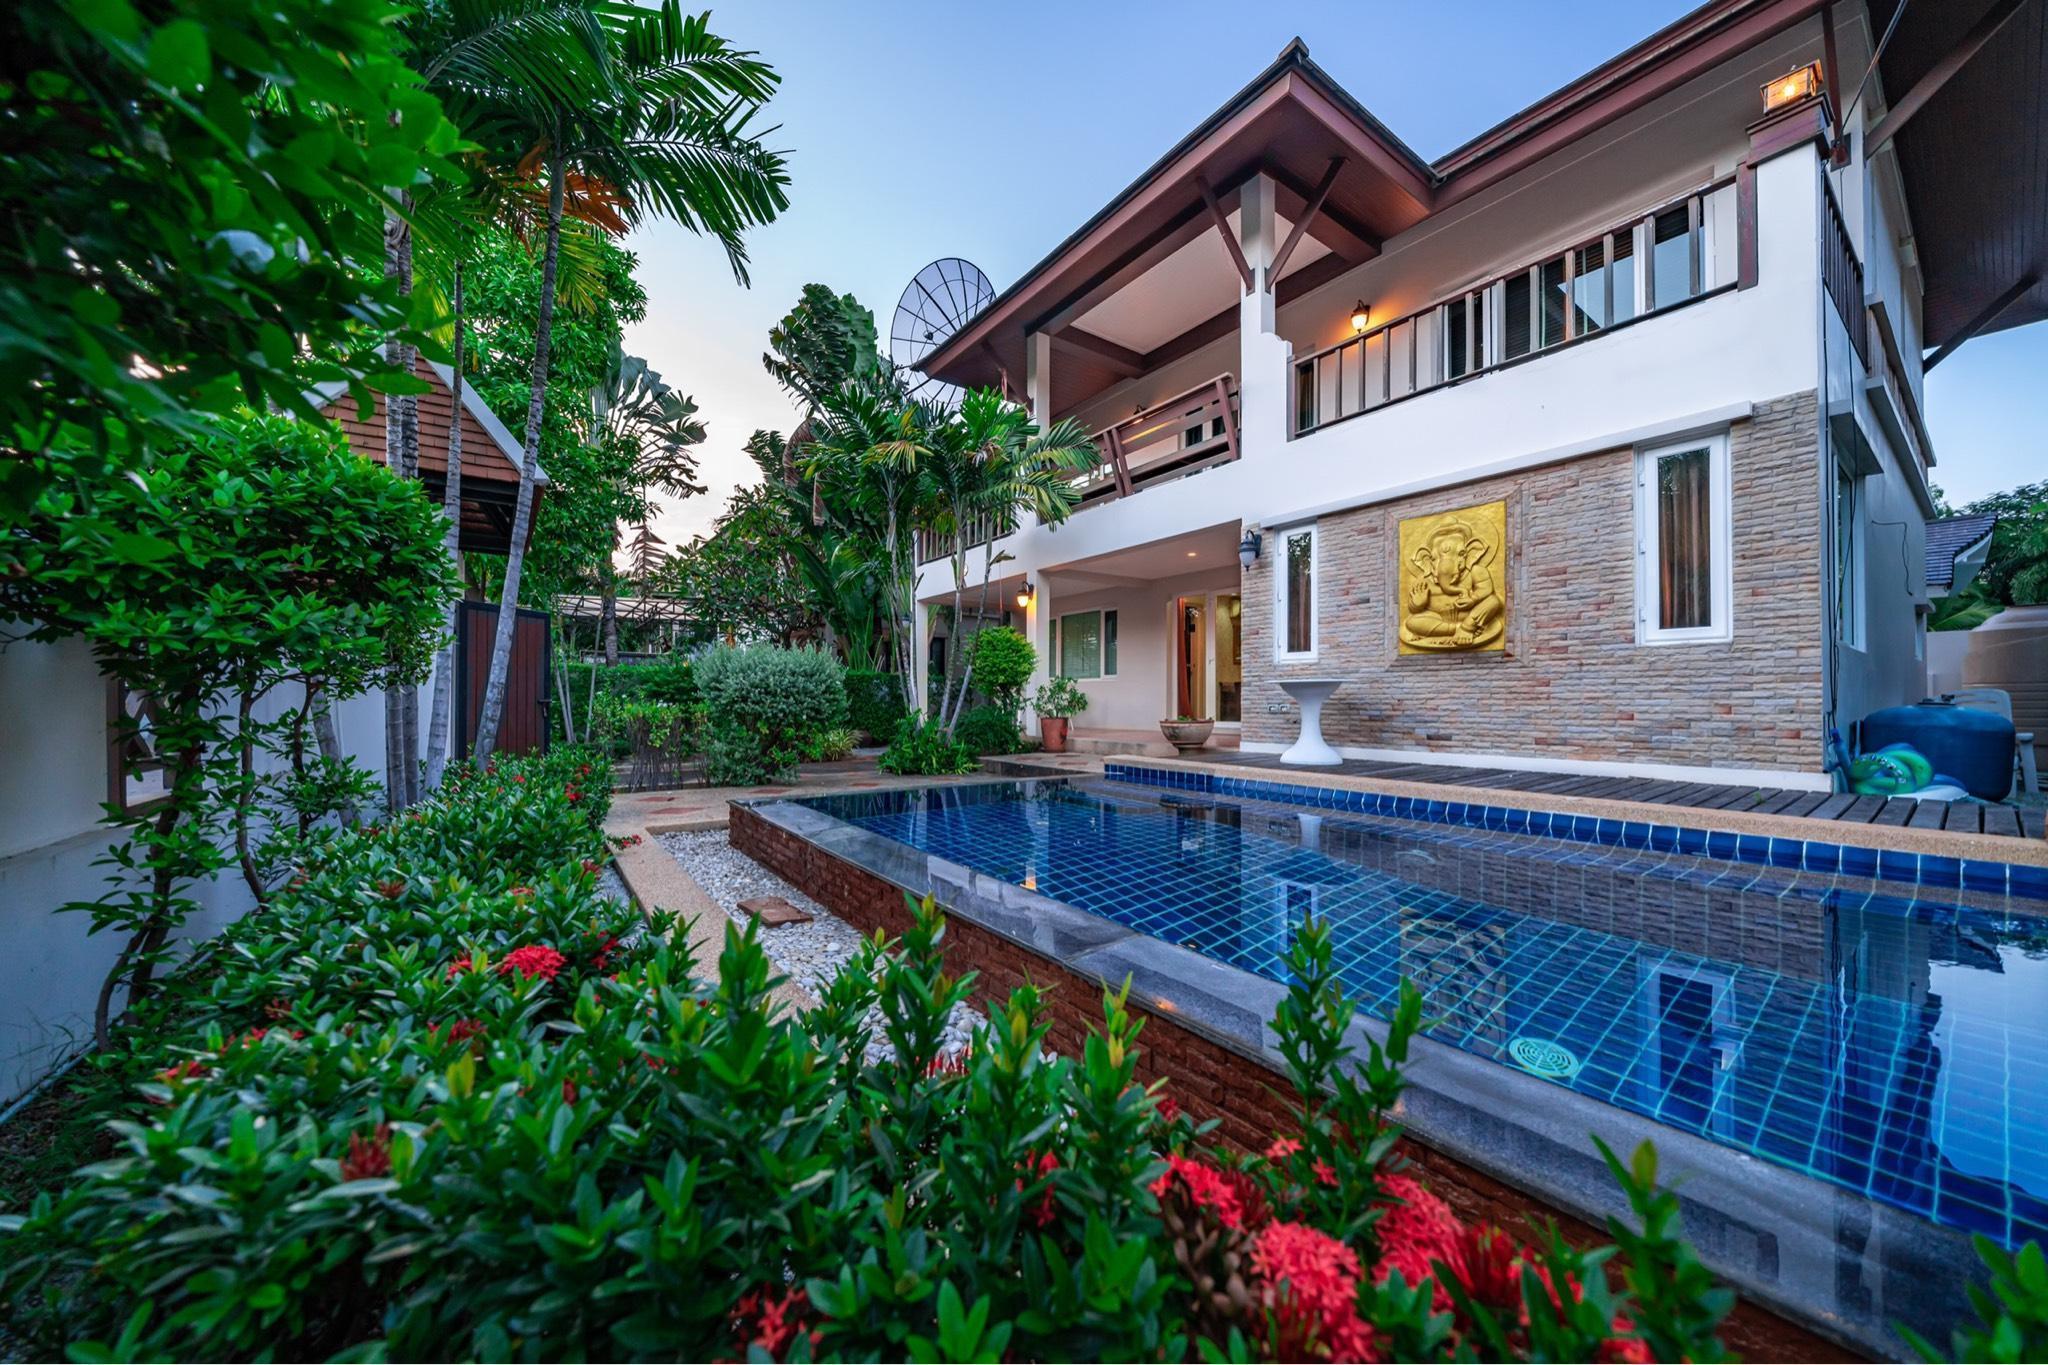 luxury pool villa by pattaya centre วิลลา 3 ห้องนอน 4 ห้องน้ำส่วนตัว ขนาด 180 ตร.ม. – พัทยาเหนือ